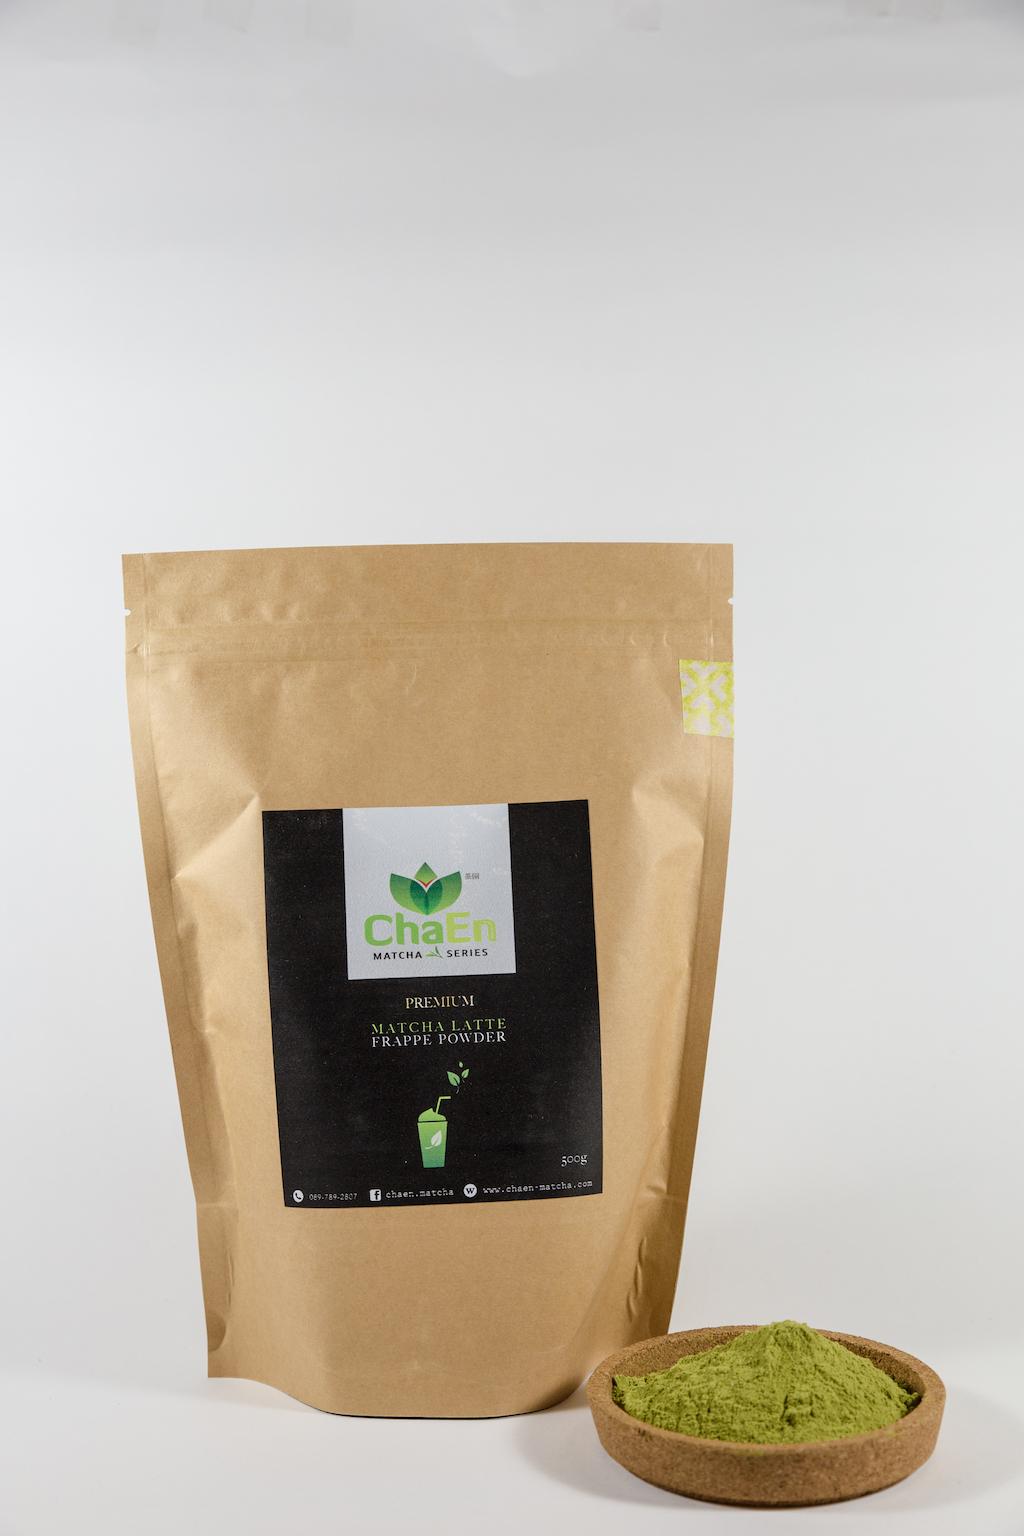 Premium Matcha Latte Frappe Powder (500g)